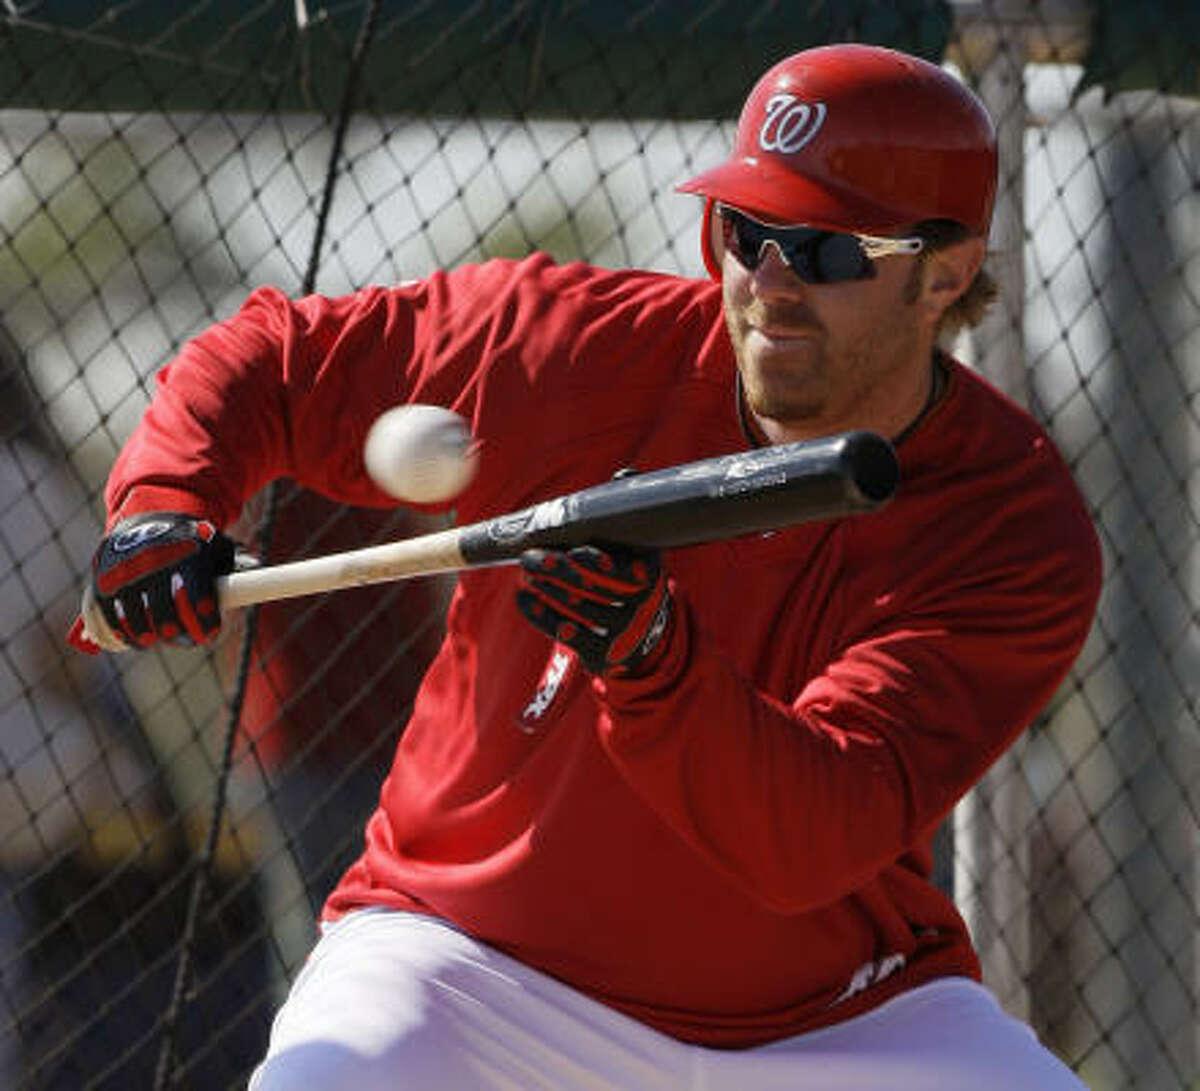 Washington Nationals first baseman Adam Dunn bunts a pitch during a spring training baseball workout.